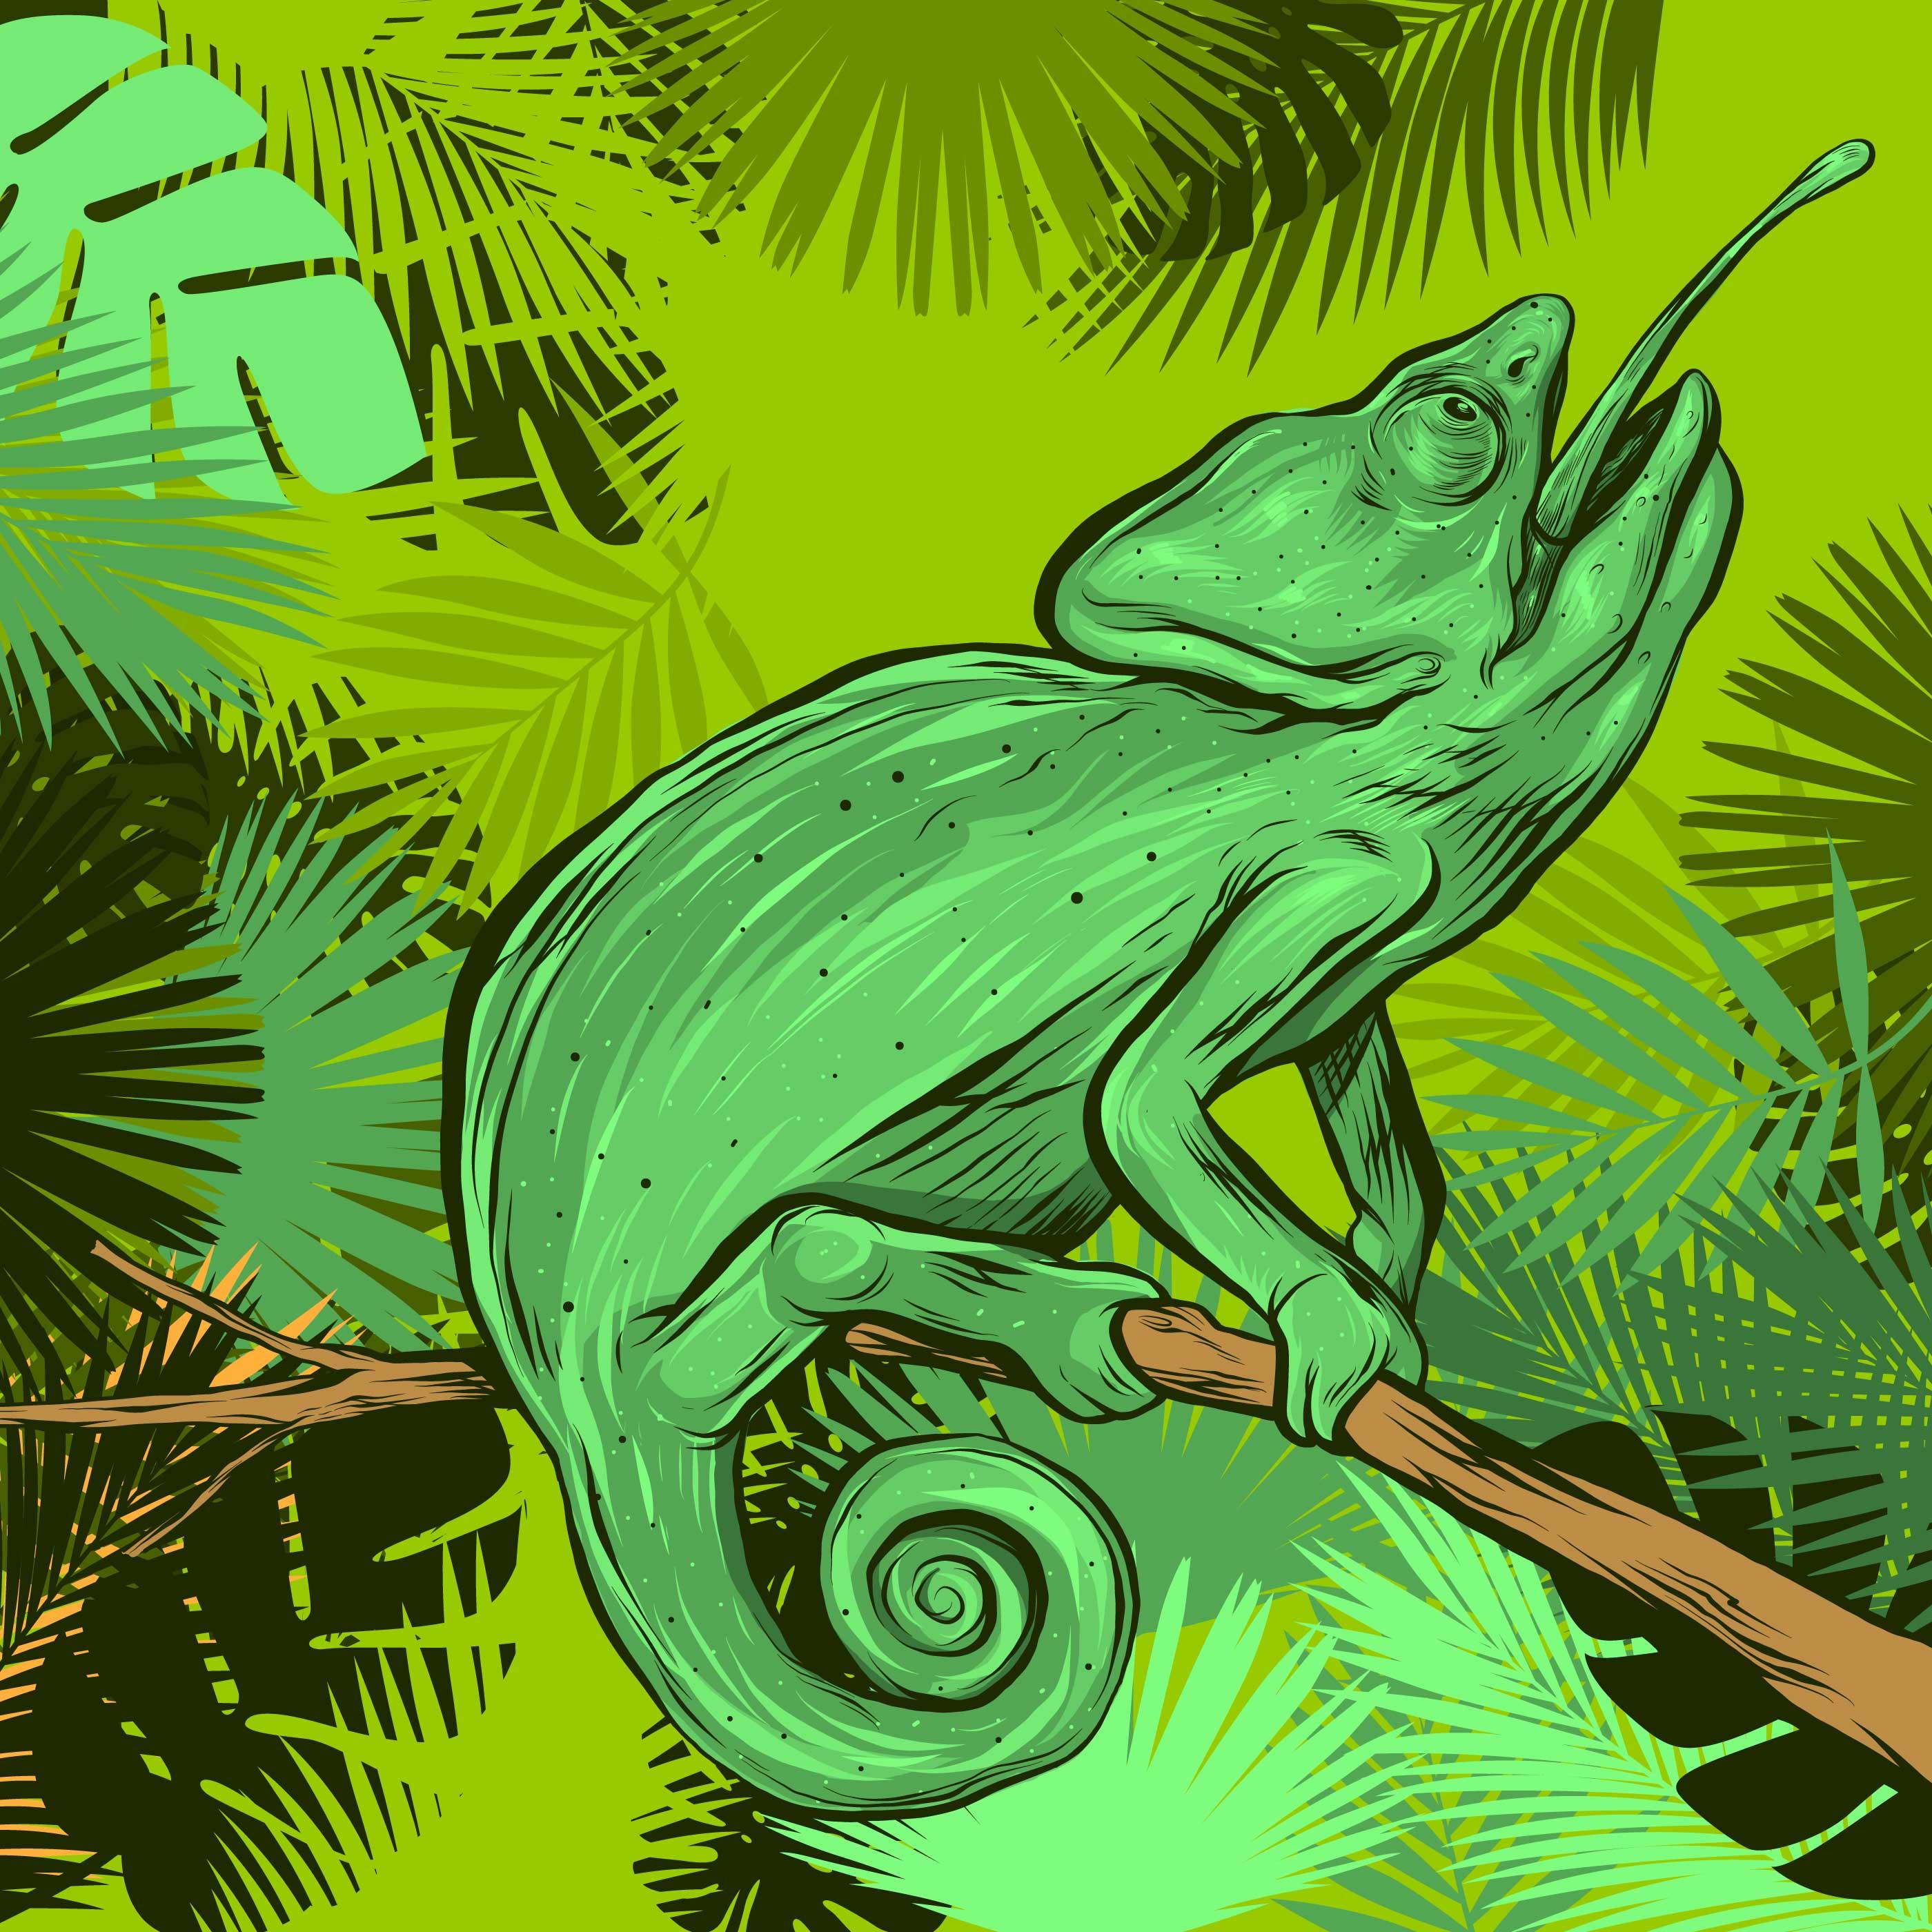 chameleon on a branch of tropical leaves frame download